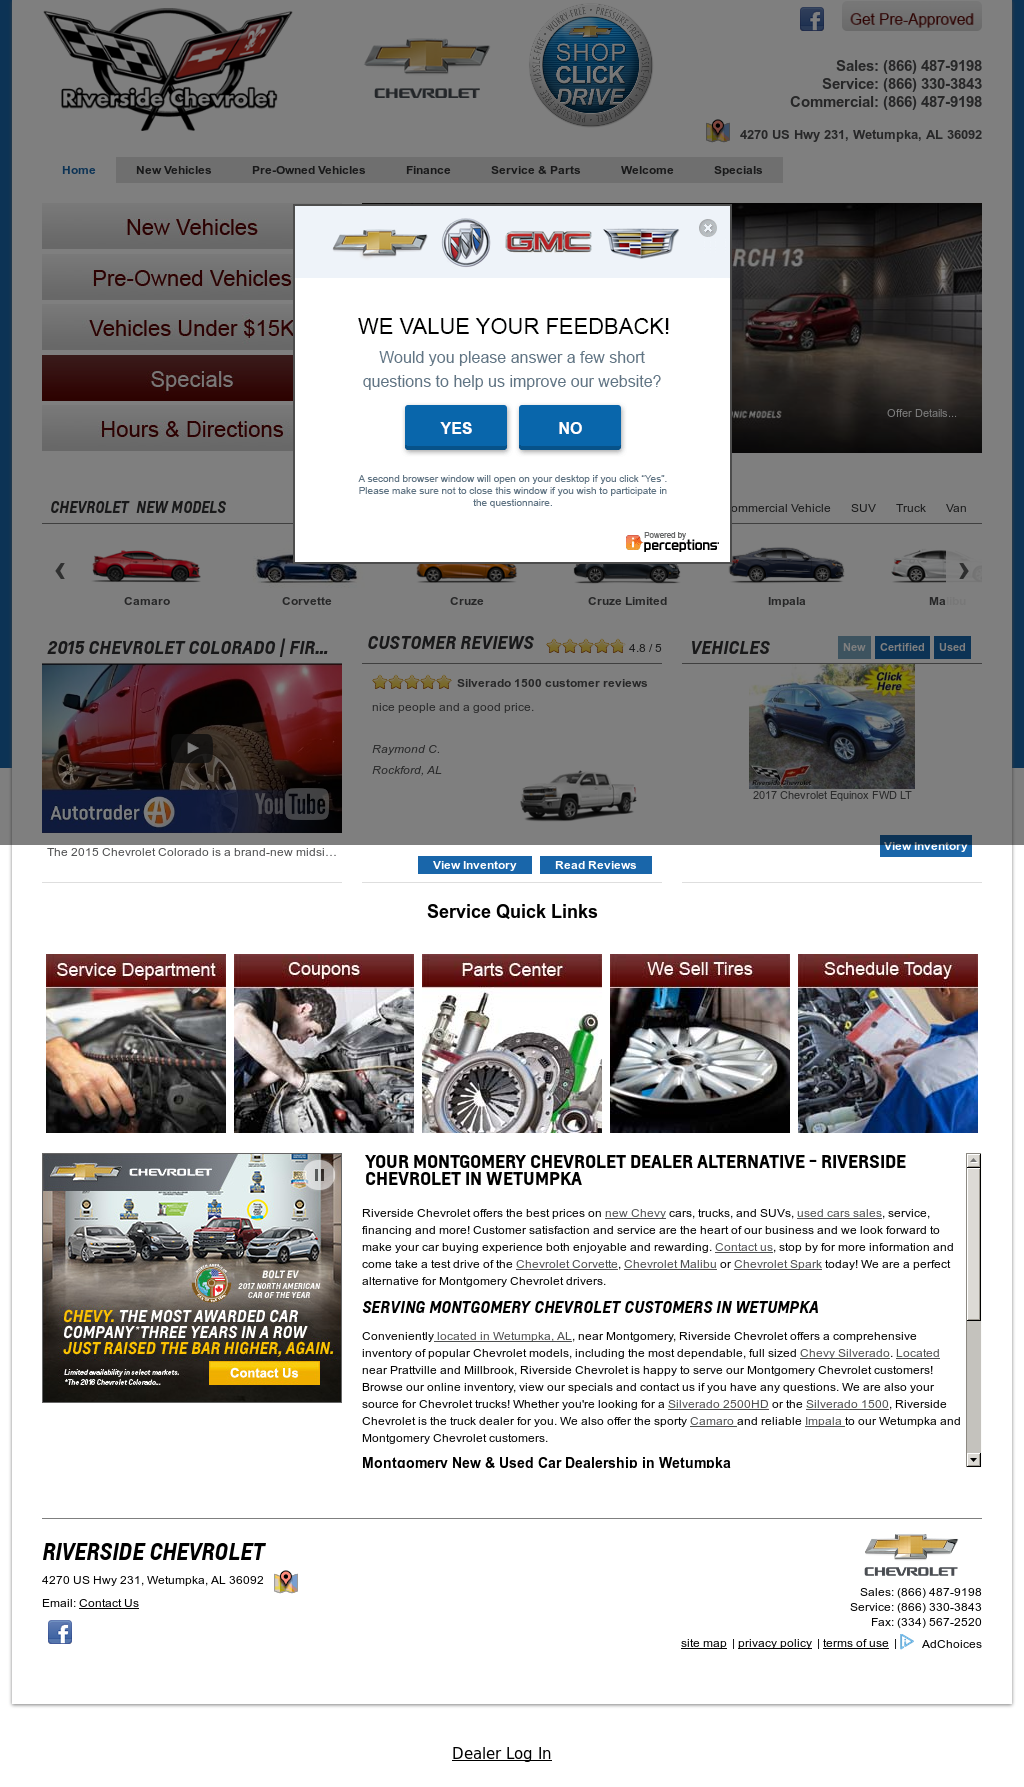 Riverside Chevrolet Olds Website History